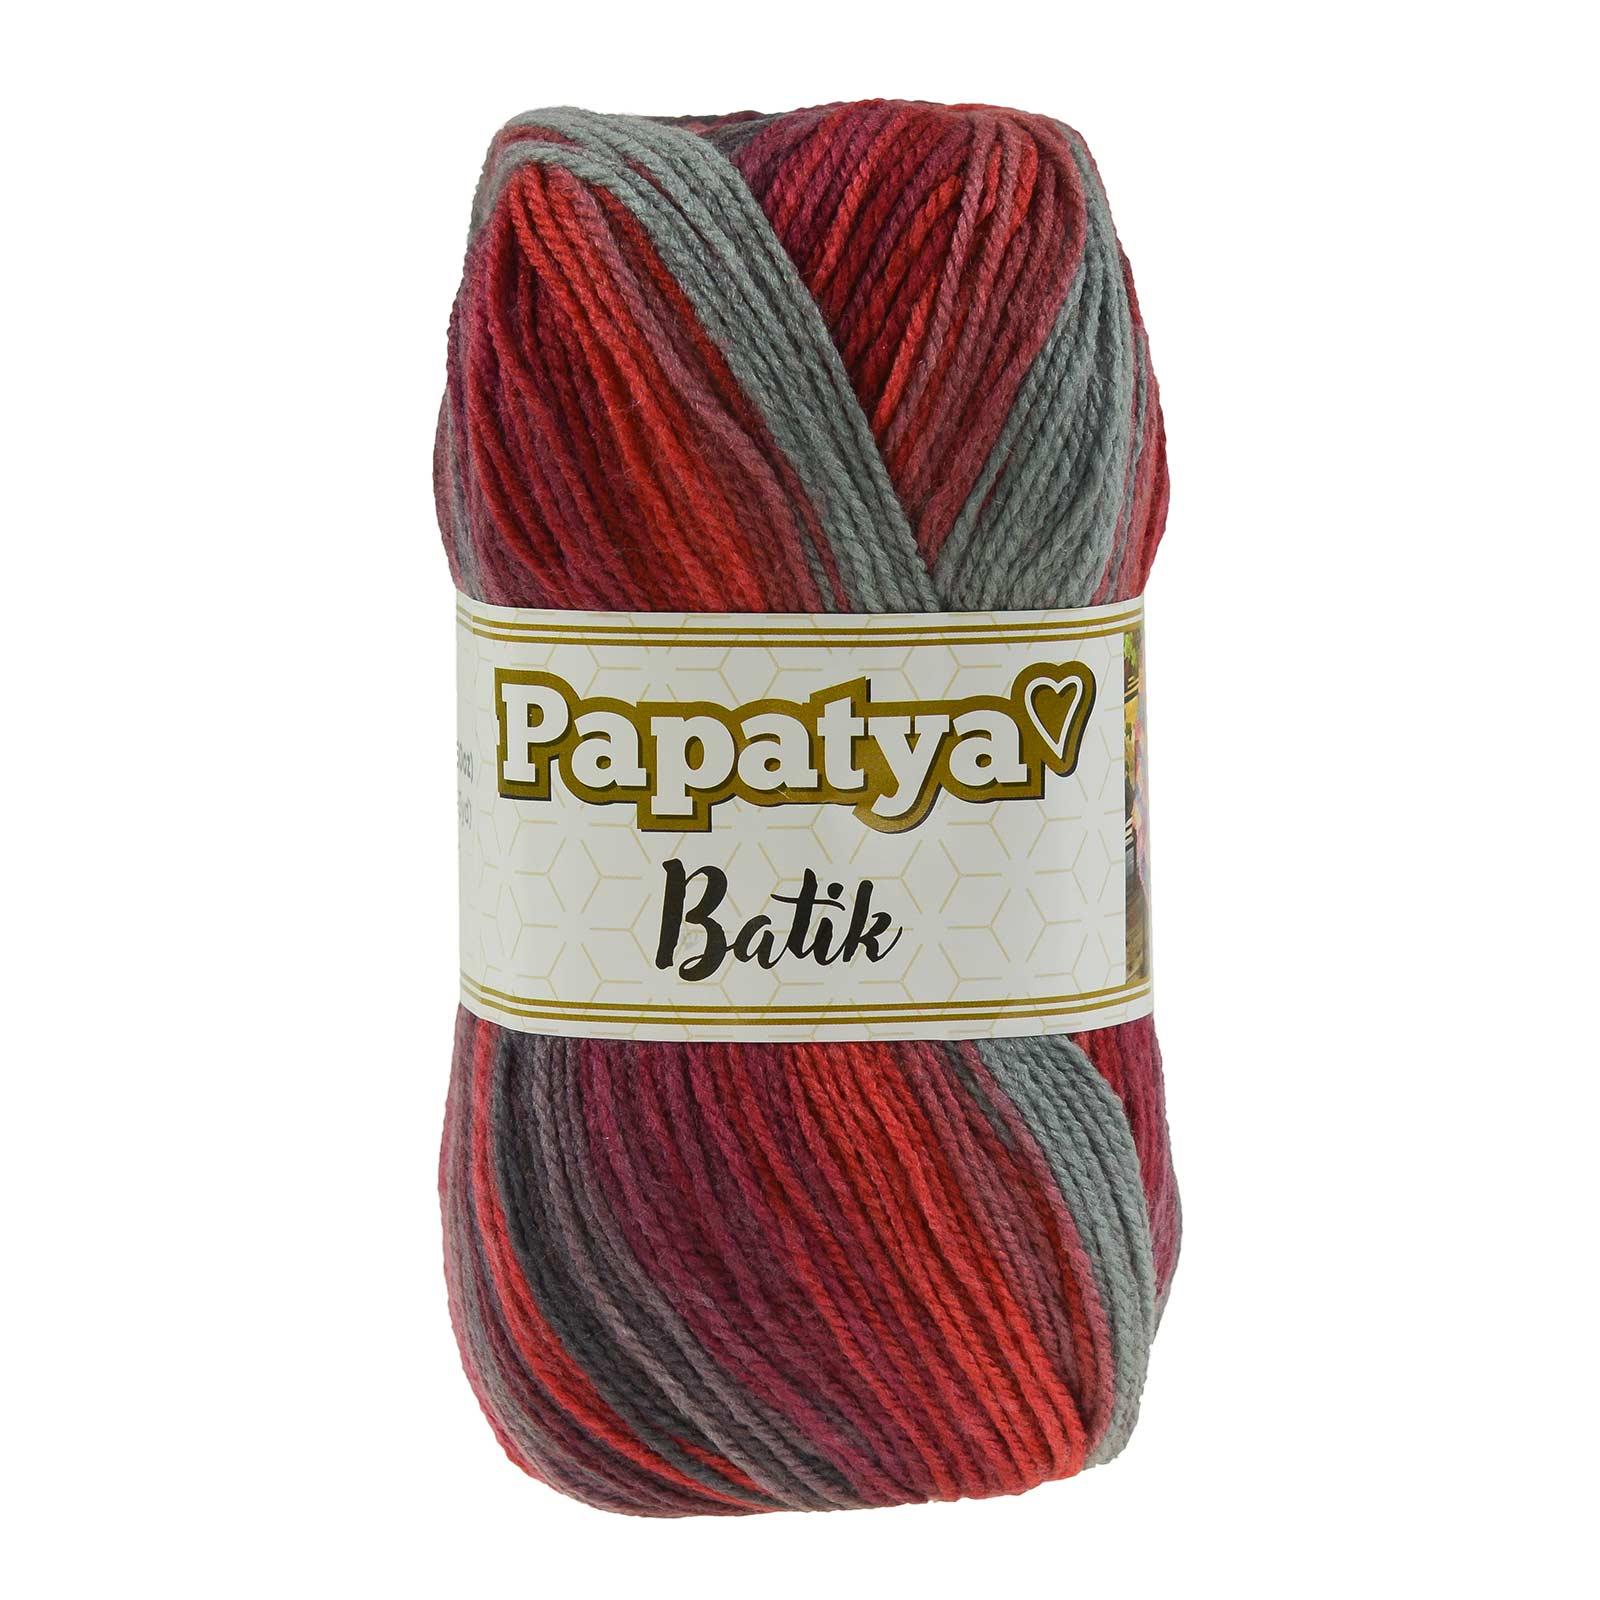 100g Farbverlaufsgarn Papatya Batik Strick-Wolle Strickgarn Häkelgarn Farbwahl – Bild 20